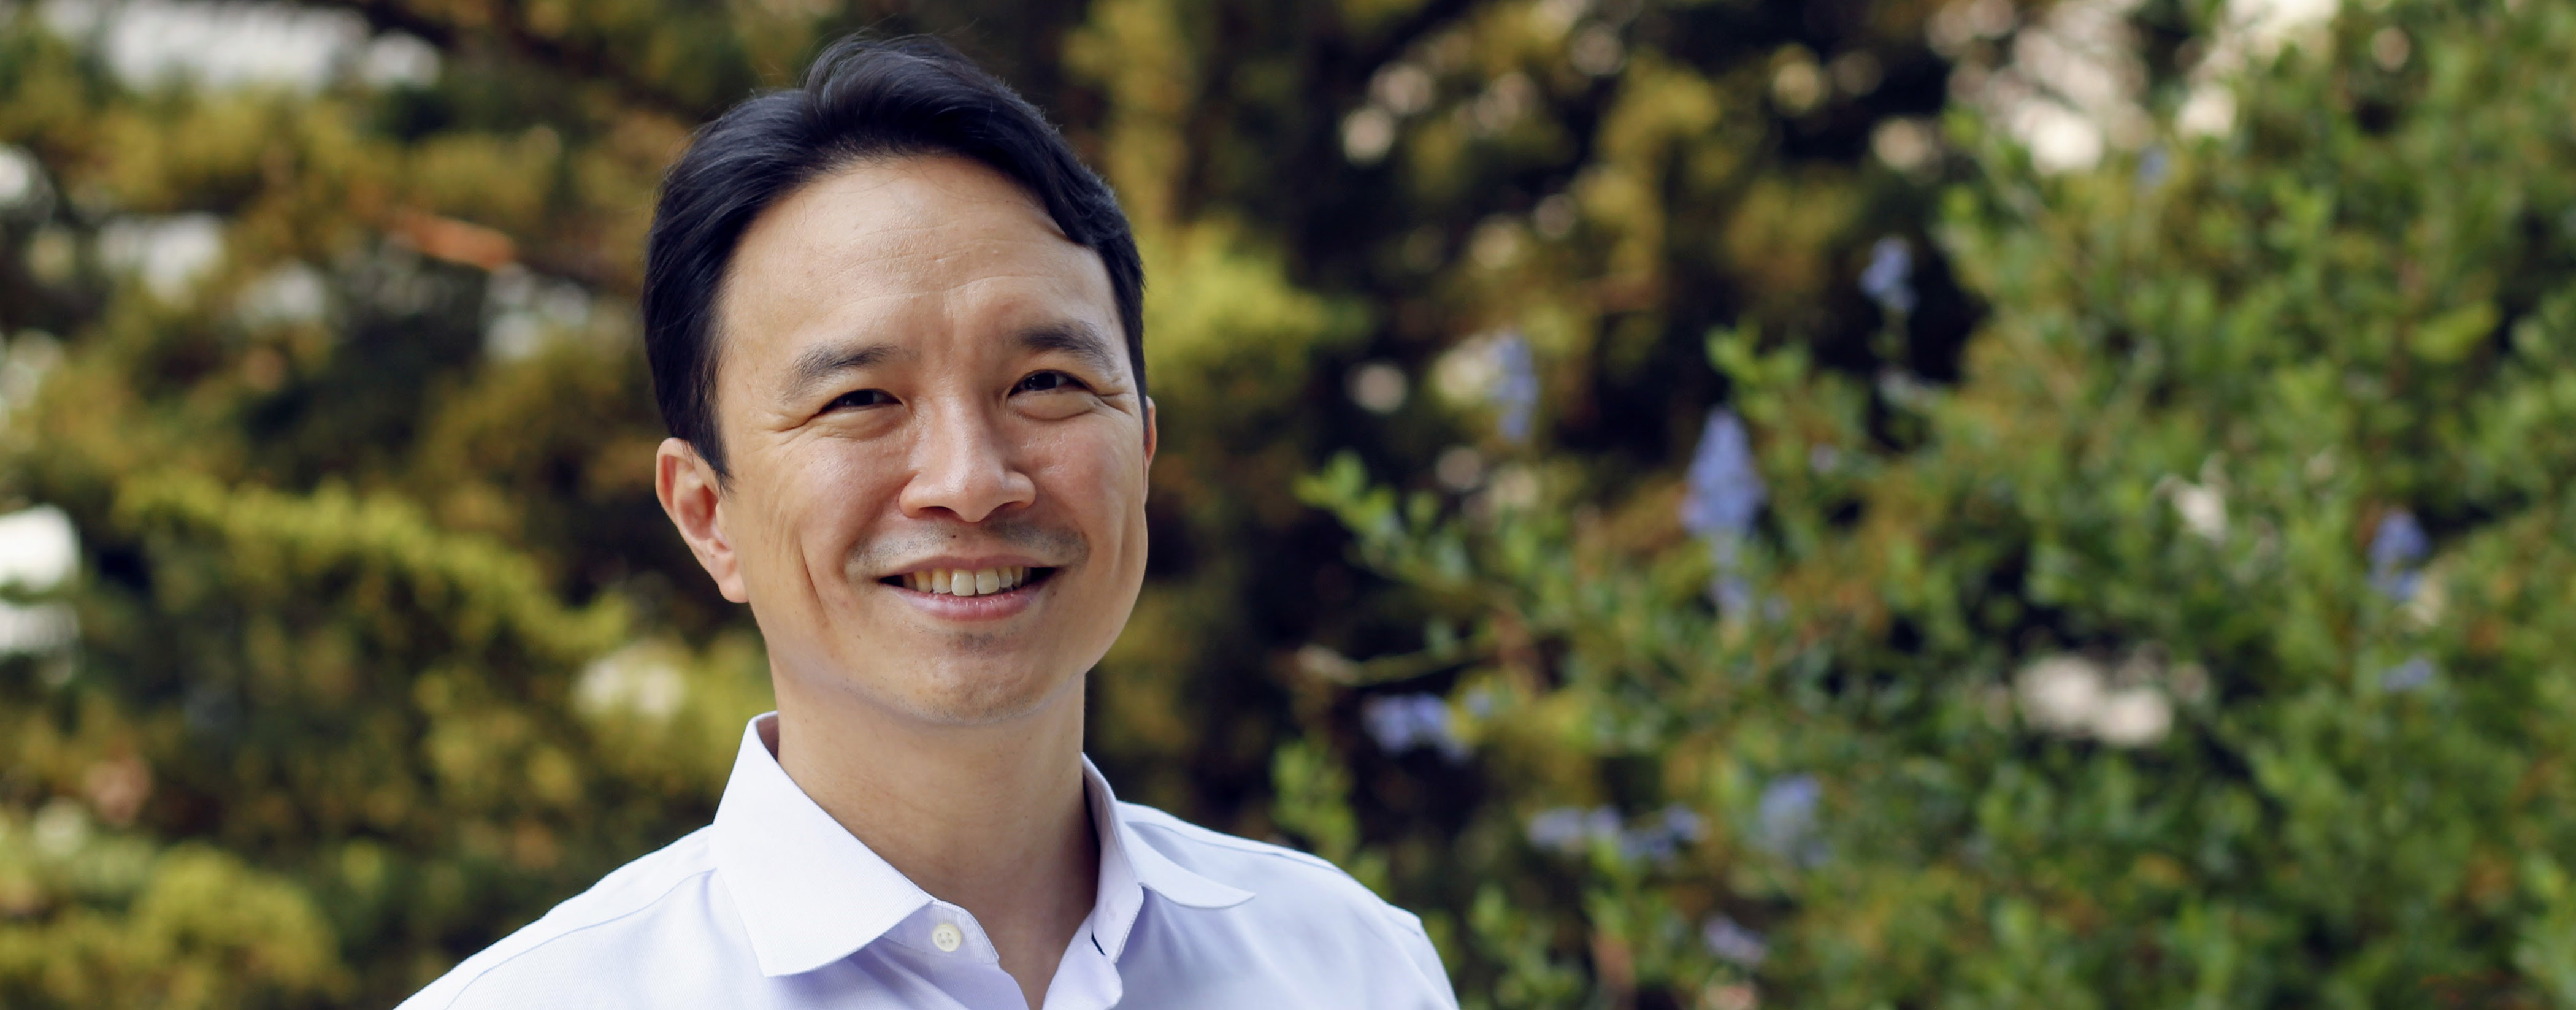 Tim Lu, MD, PhD